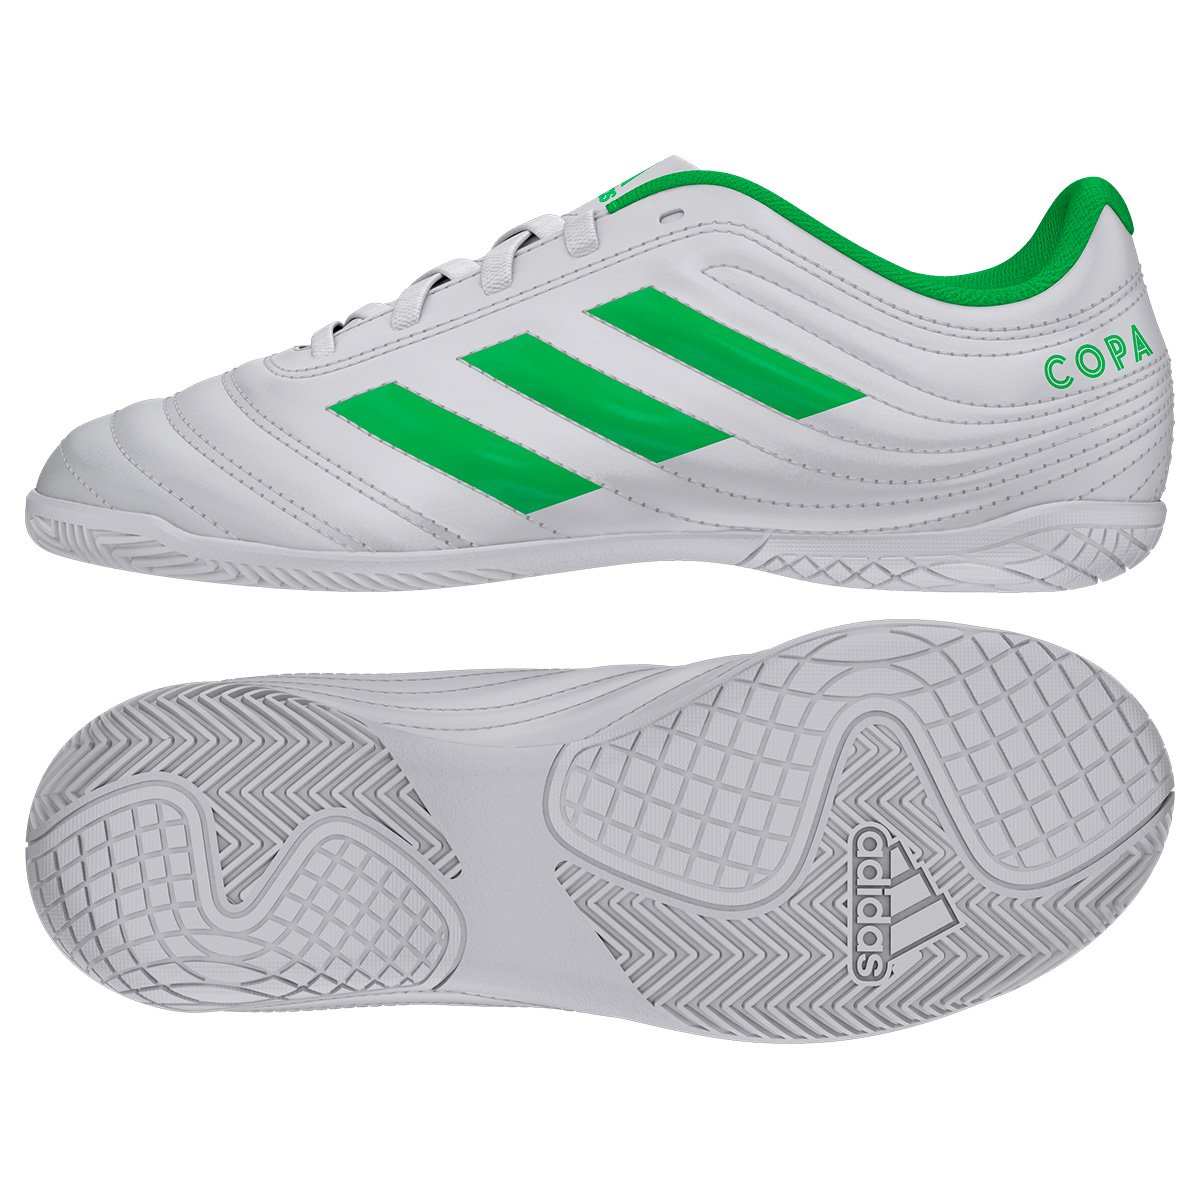 089c594749 Foto 2 - Chuteira Futsal Infantil Adidas Copa 19 4 IN